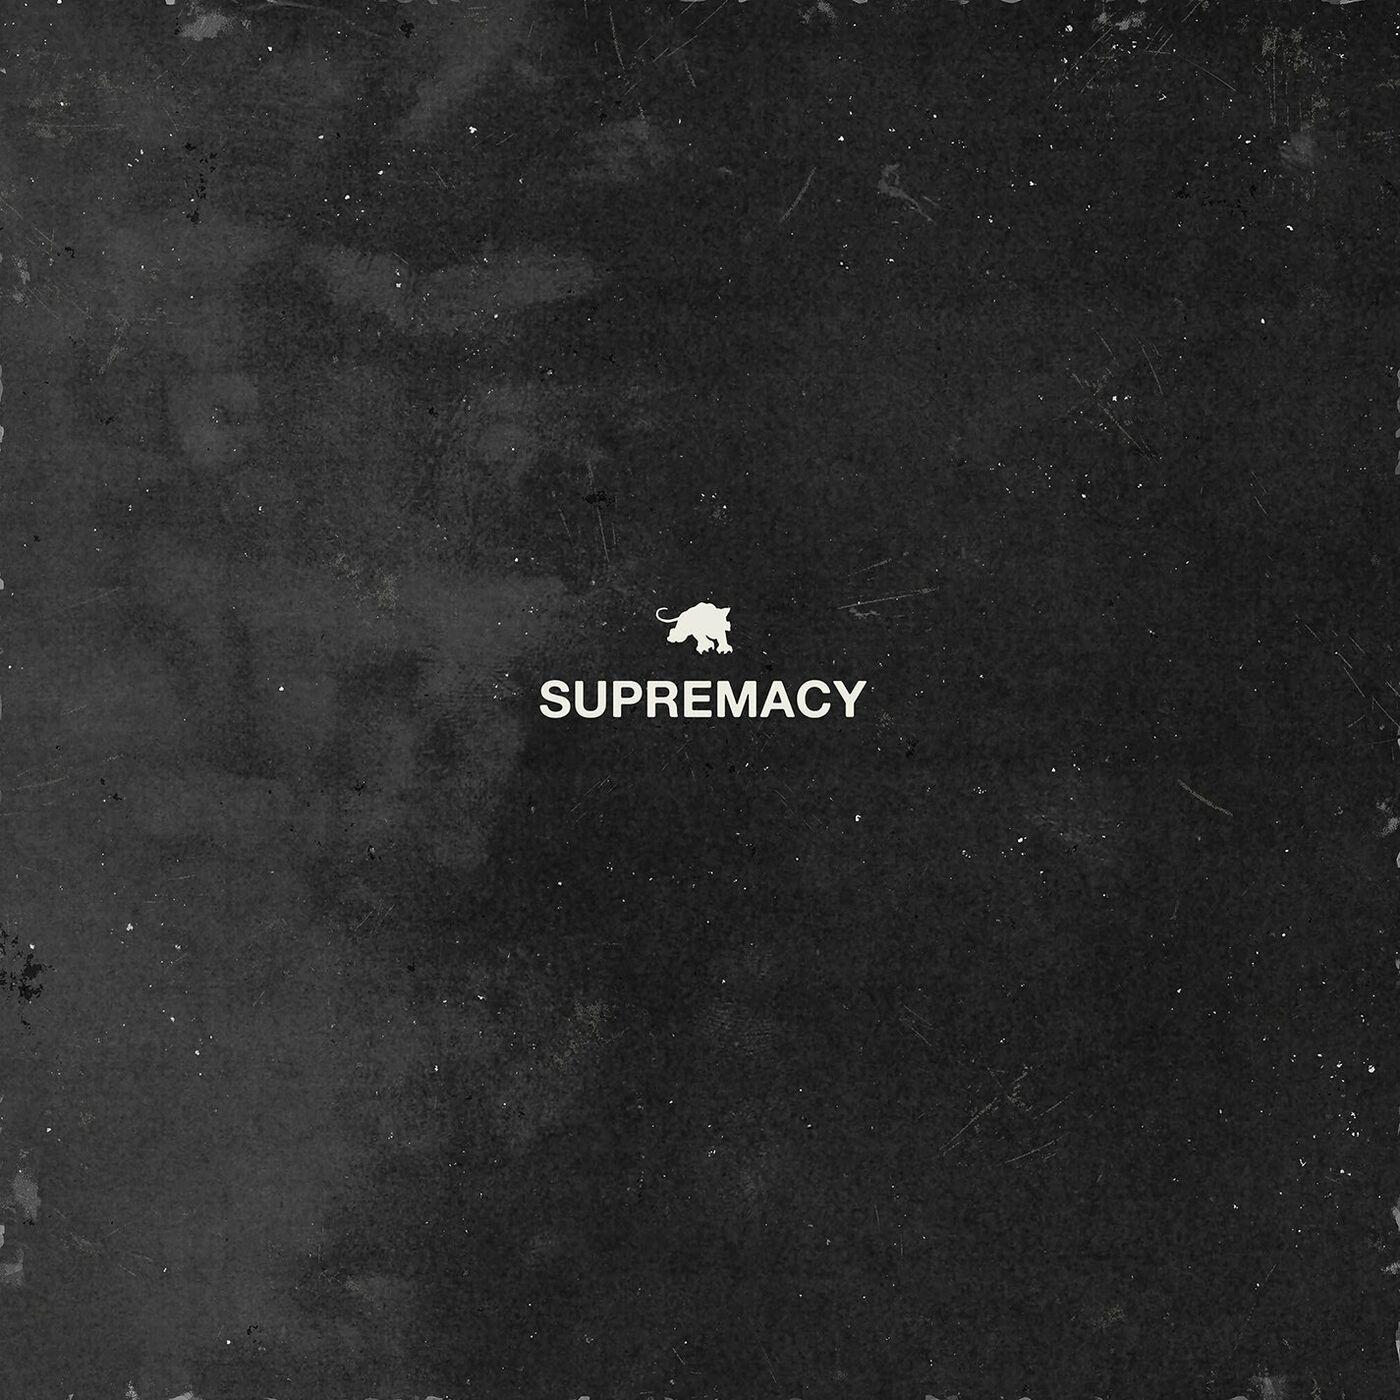 FEVER 333 - SUPREMACY [single] (2020)